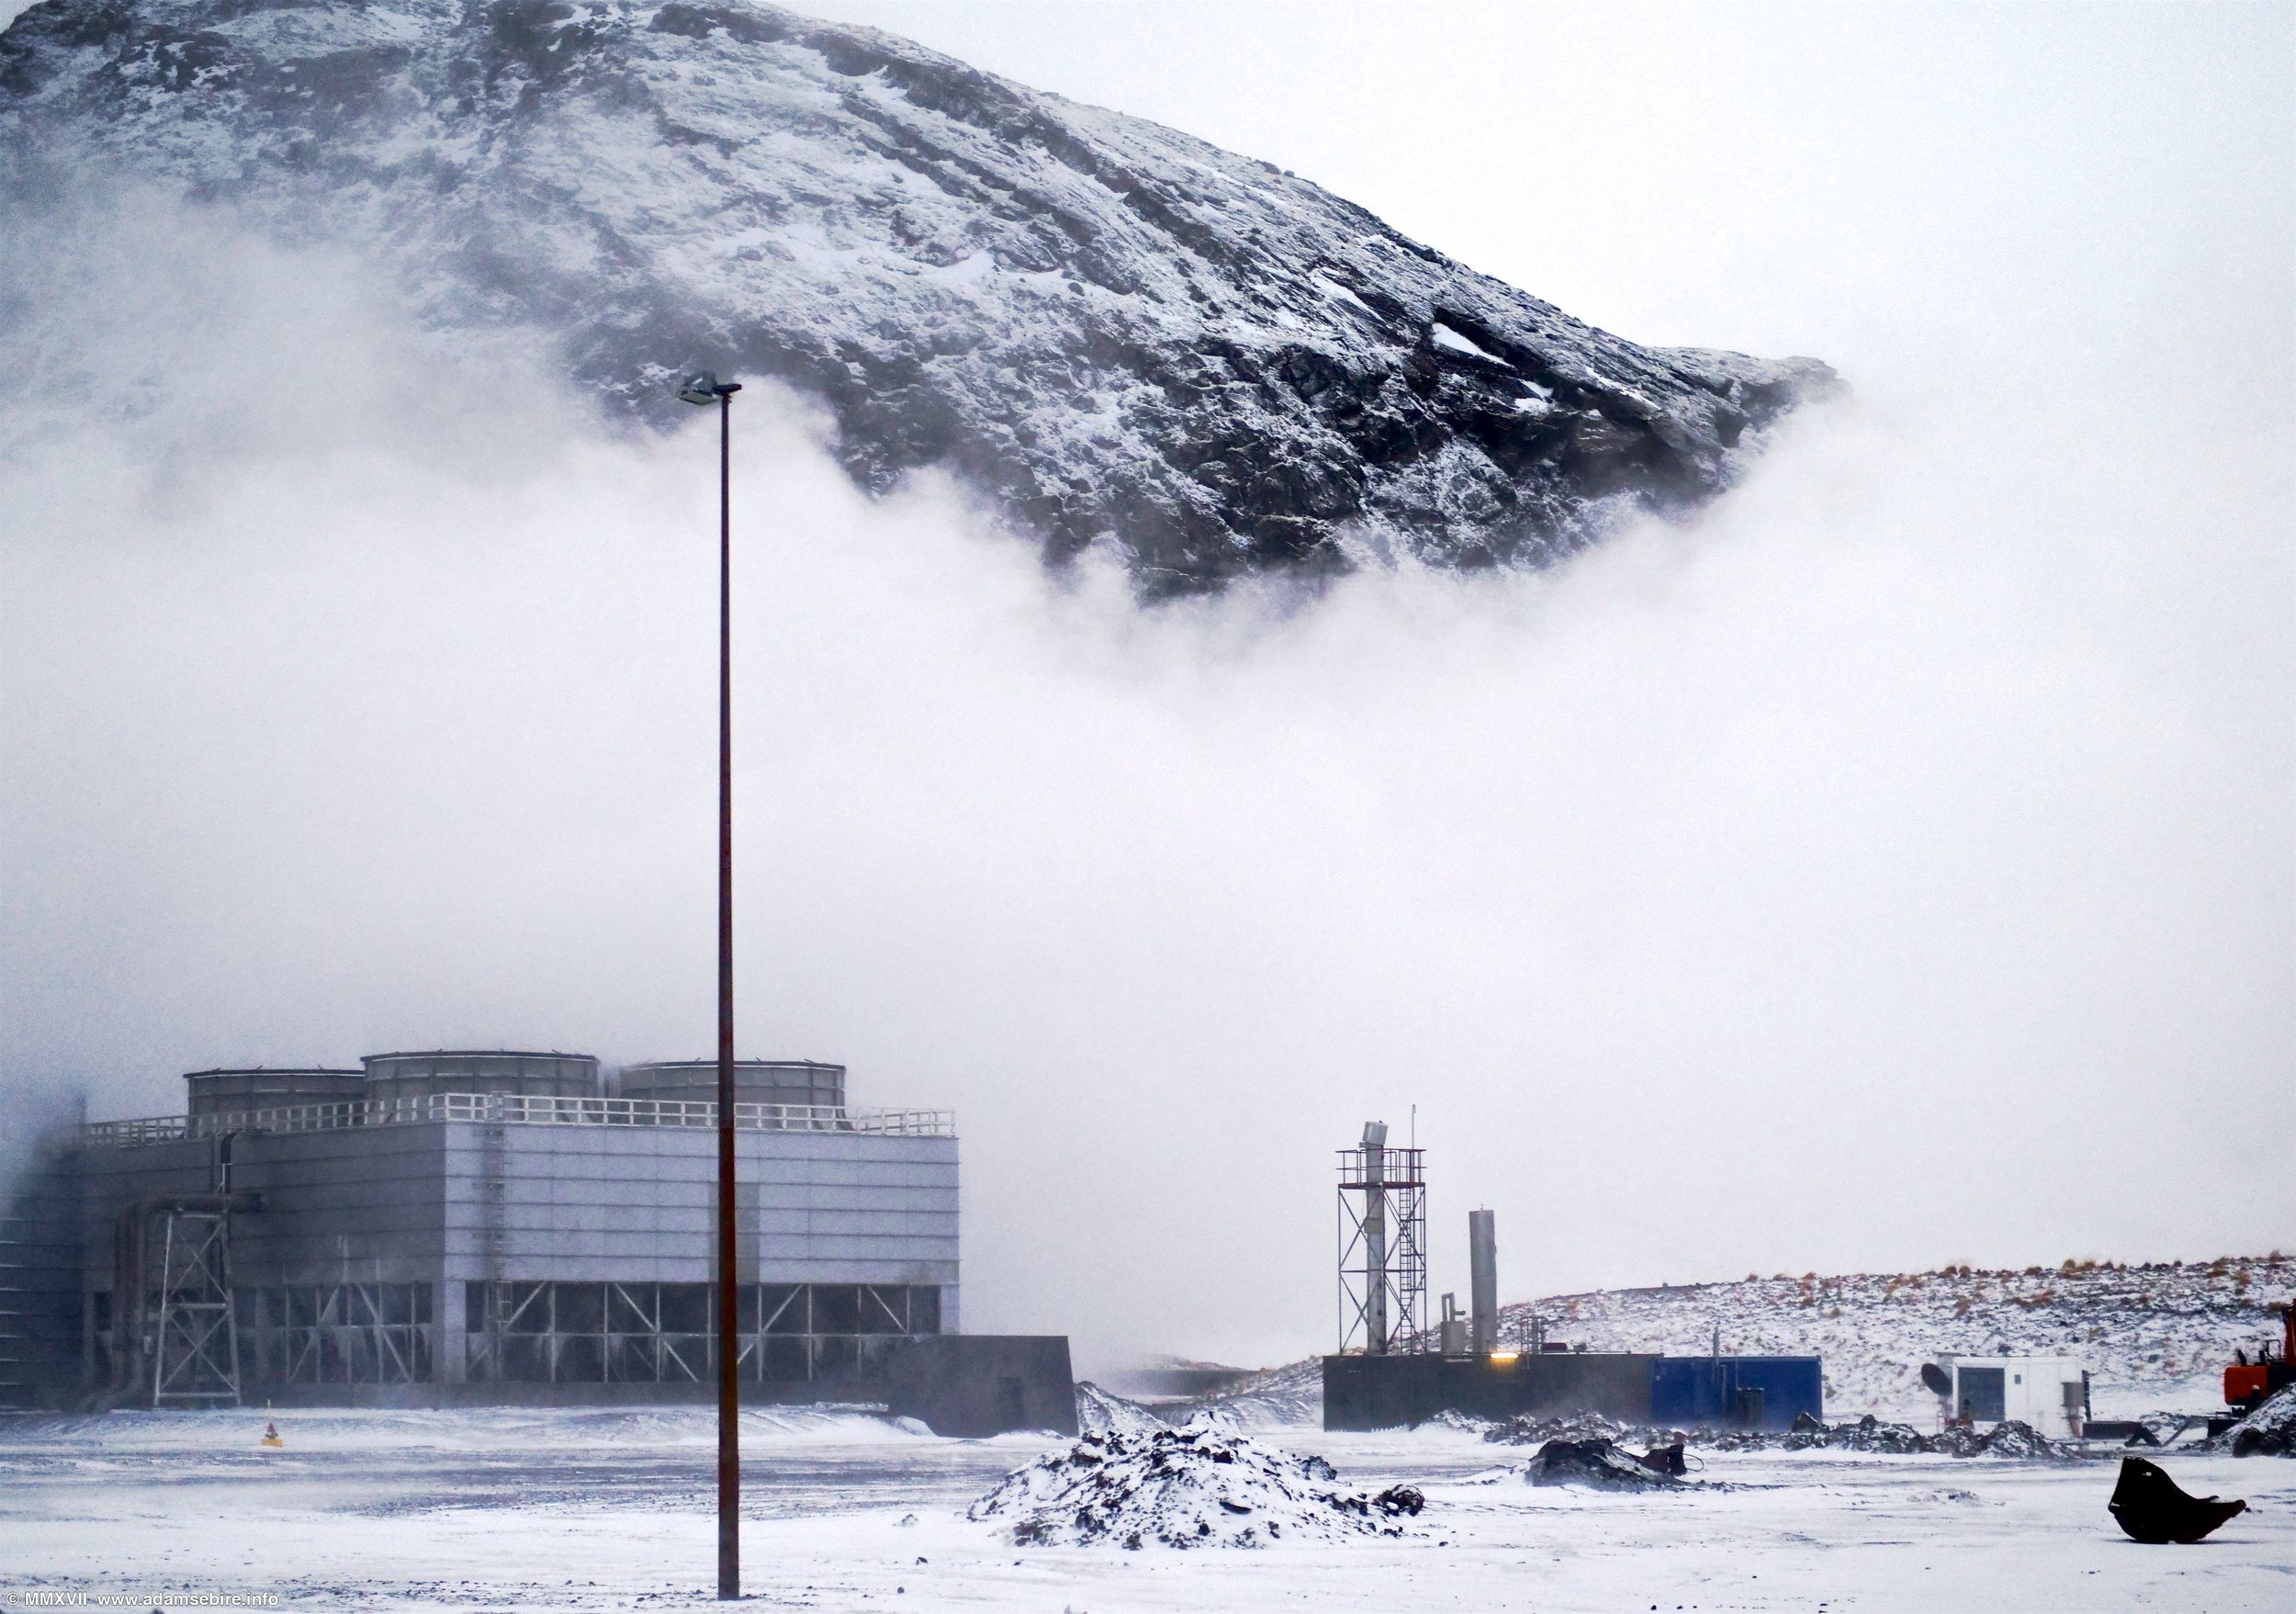 CO₂ DAC (Direct Air Capture) unit, Climeworks / CarbFix2 Hellisheiði geothermal power plant, Iceland